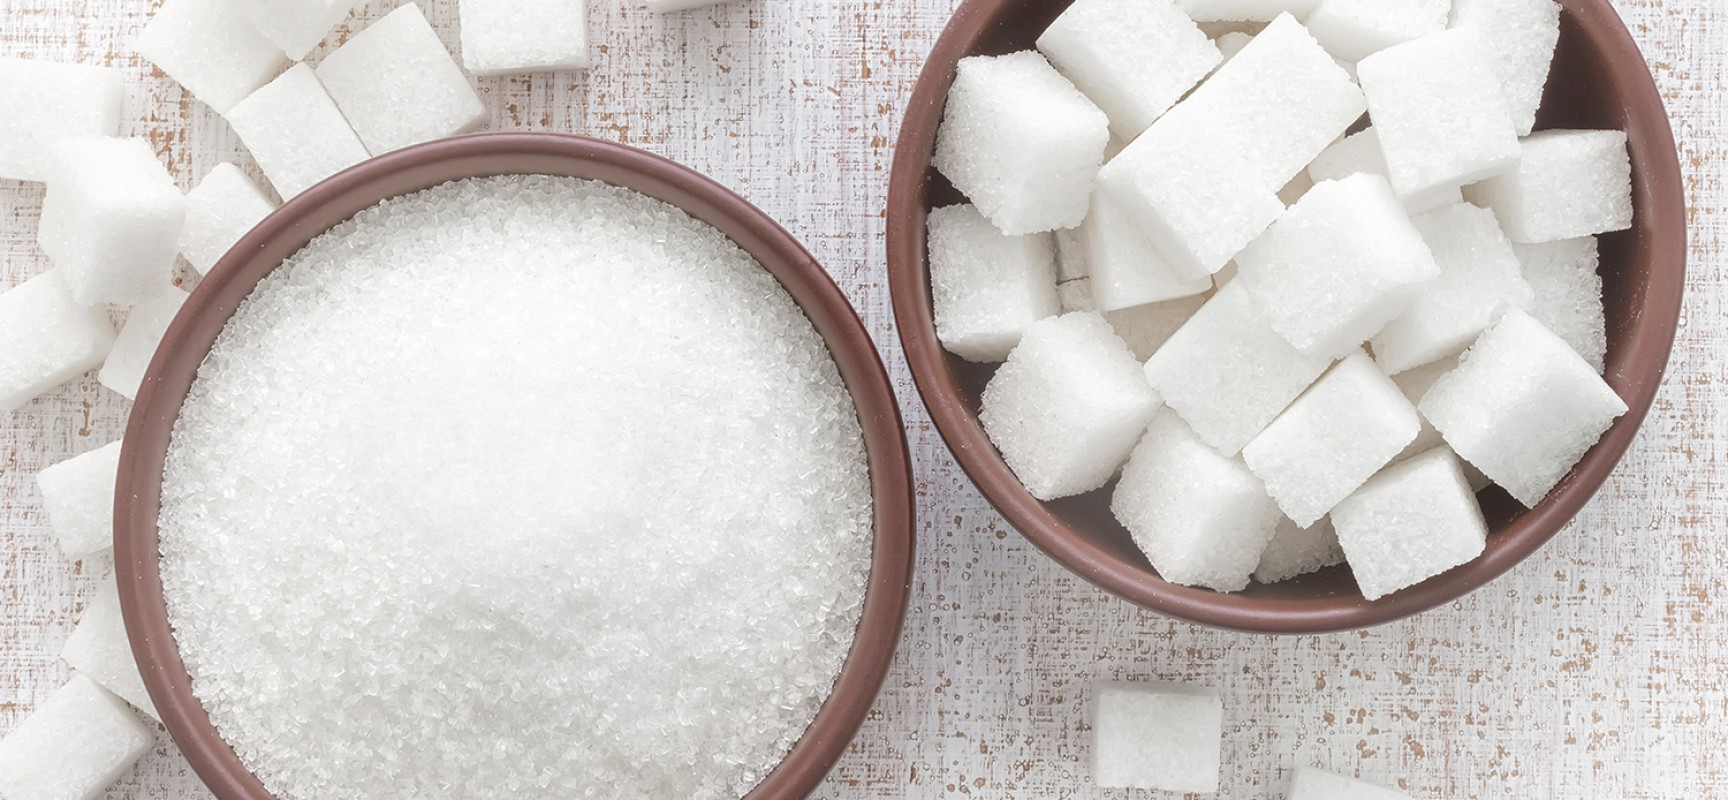 Consumo de açúcar aumenta no Brasil